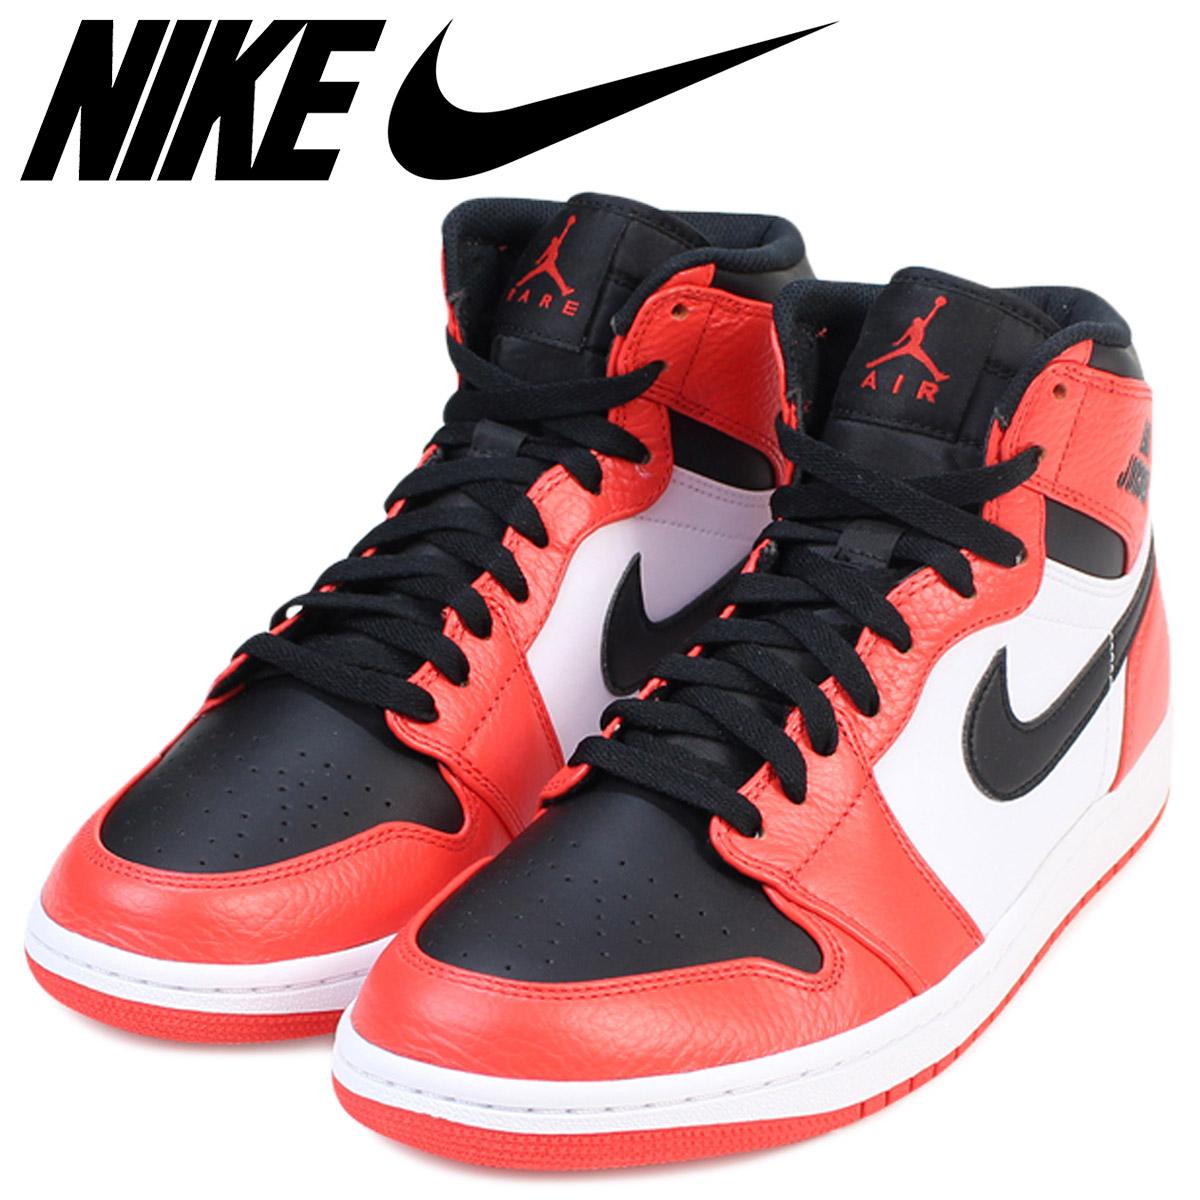 e5797a281cd Nike NIKE Air Jordan 1 nostalgic high sneakers AIR JORDAN 1 RETRO HI men  332,550- ...